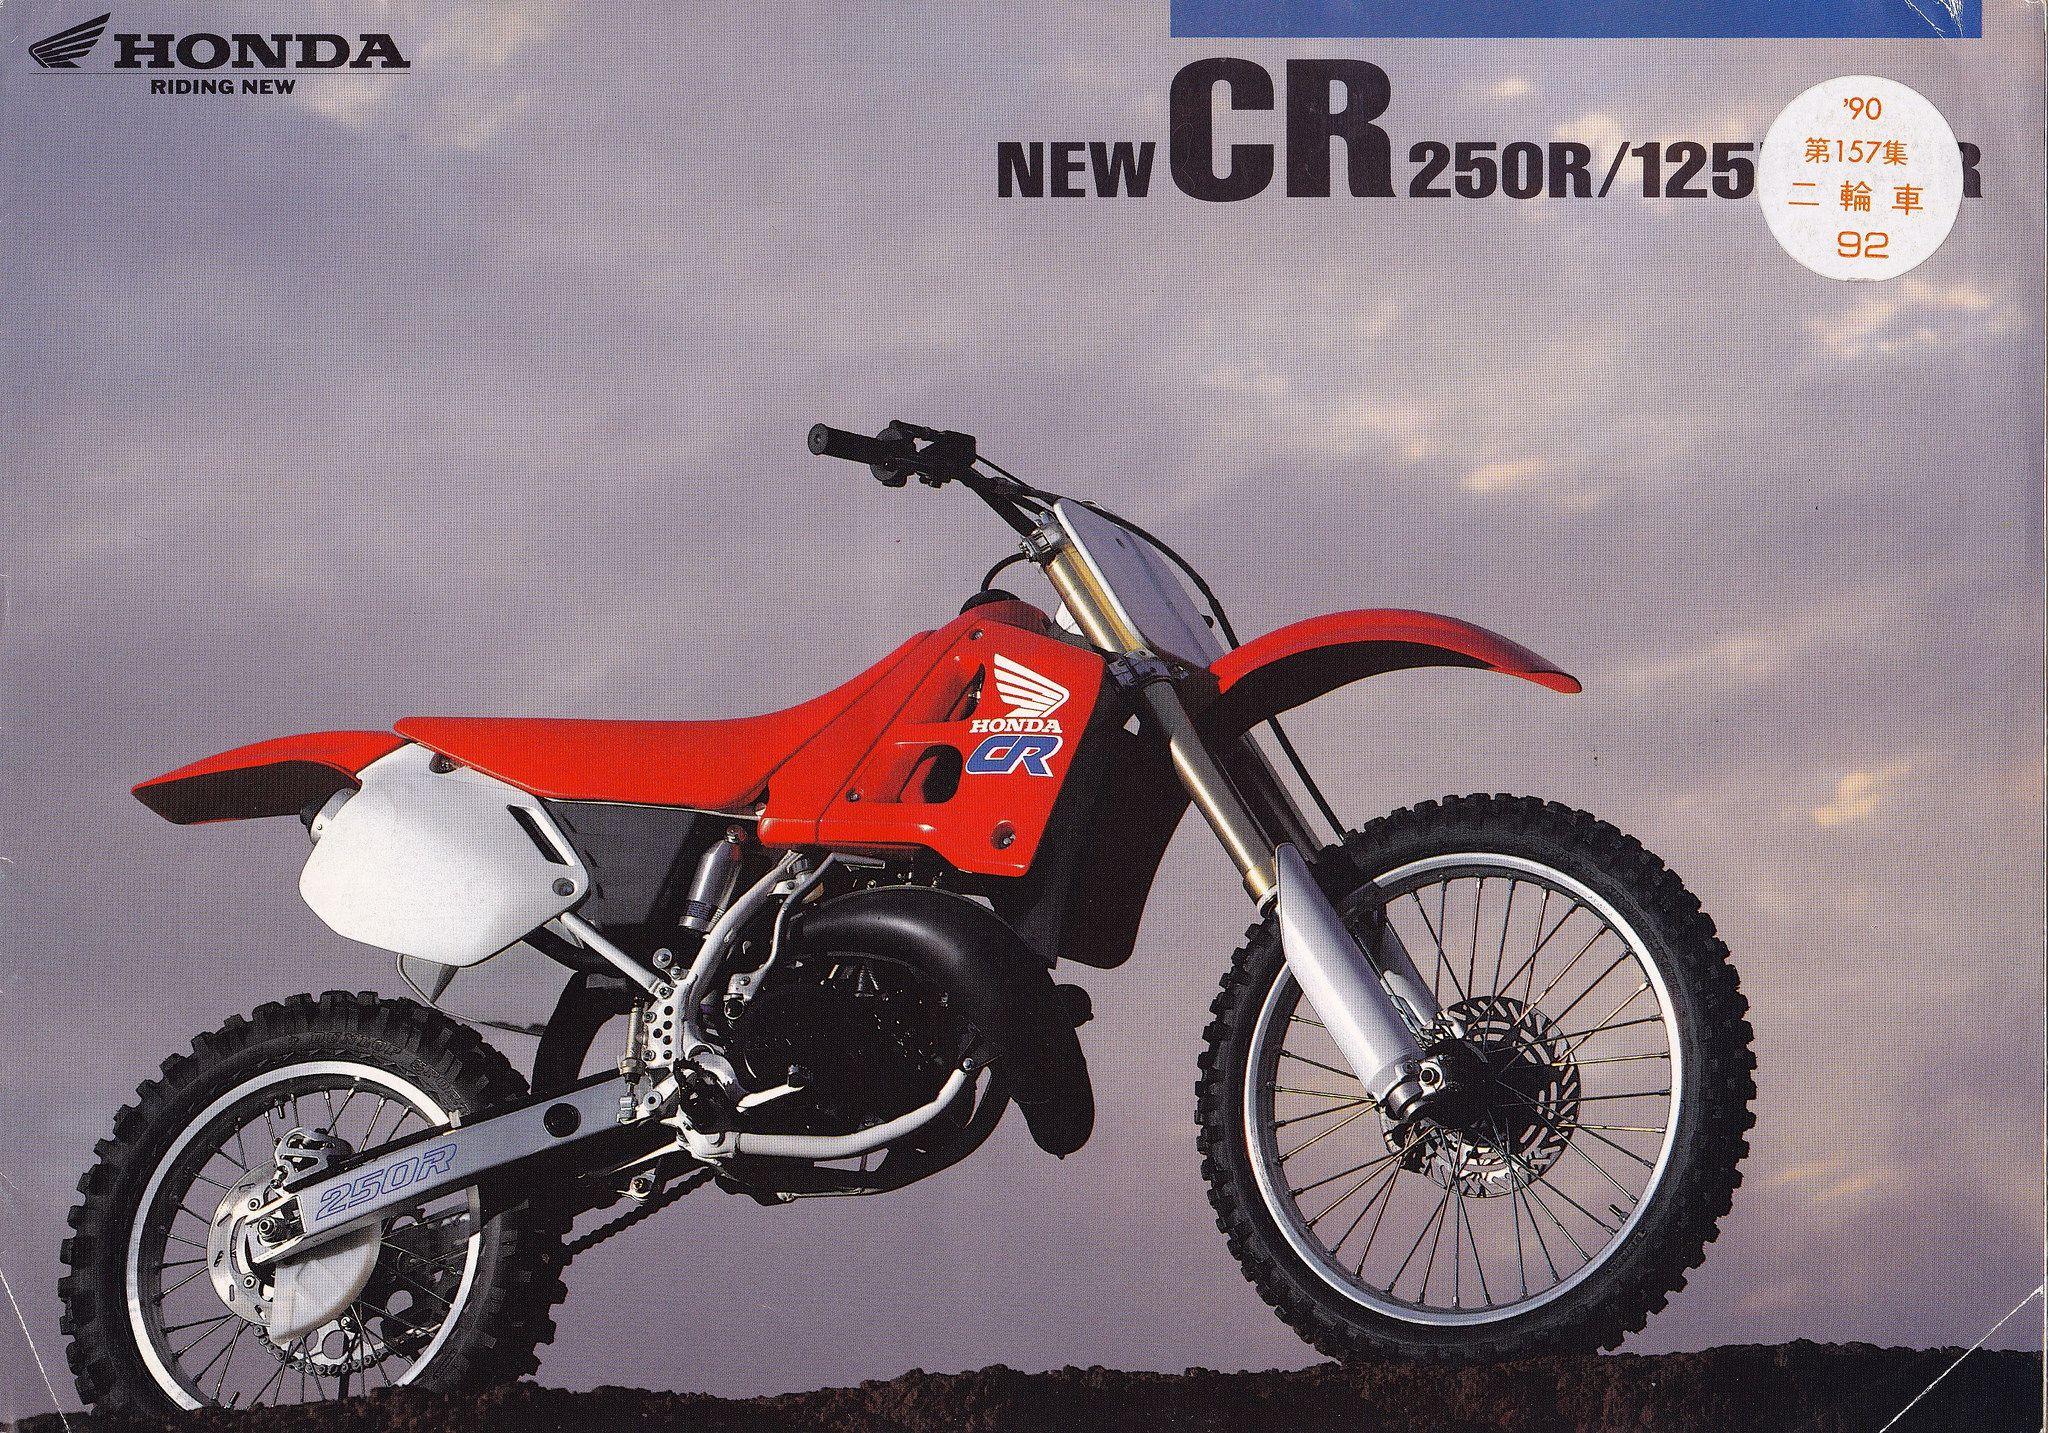 1990 Honda Cr Japanese Brochure Page 1 Honda Cr Honda New Honda